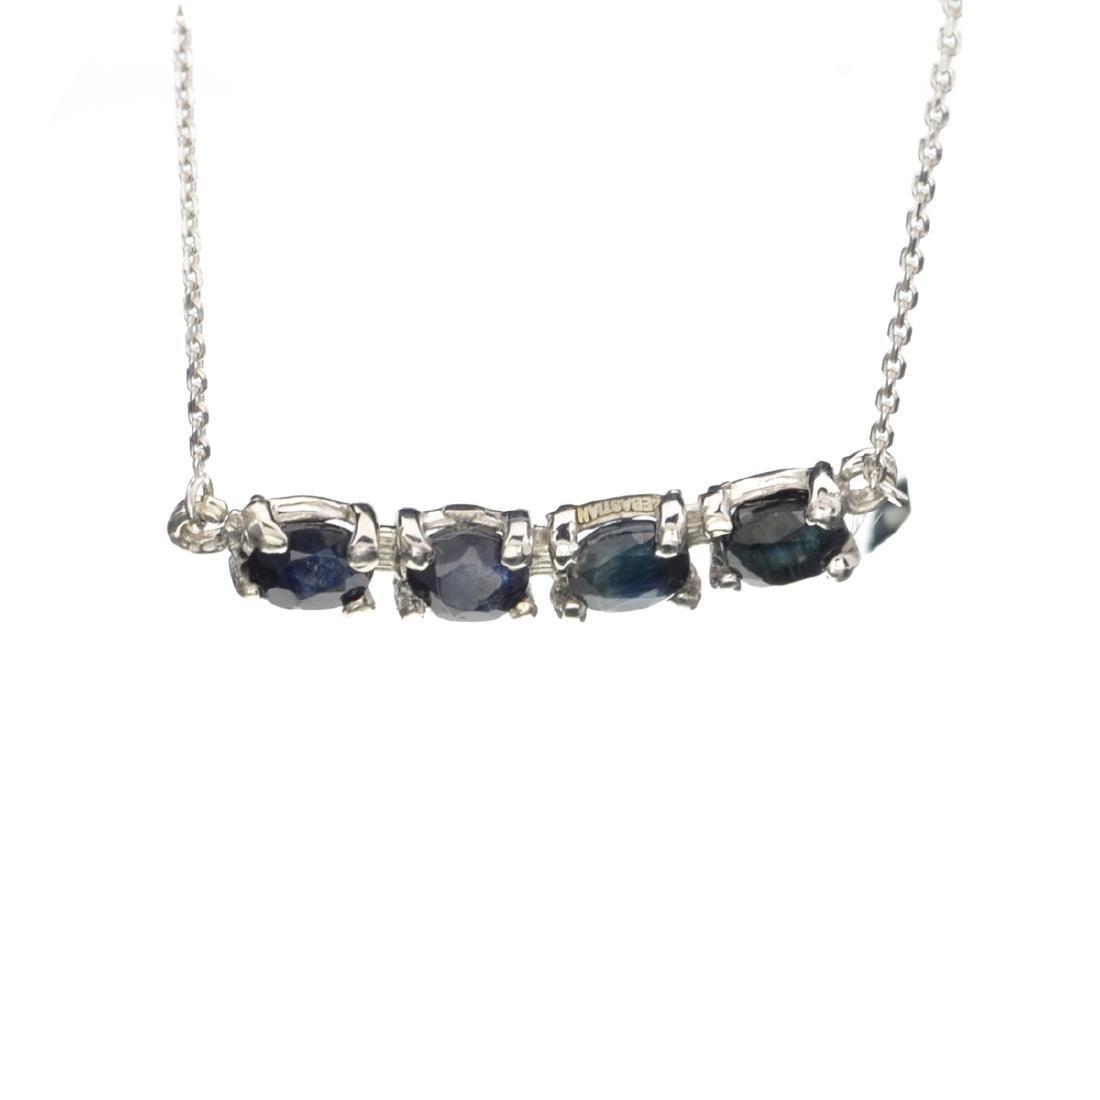 Fine Jewelry Designer Sebastian 1.85CT Oval Cut Blue